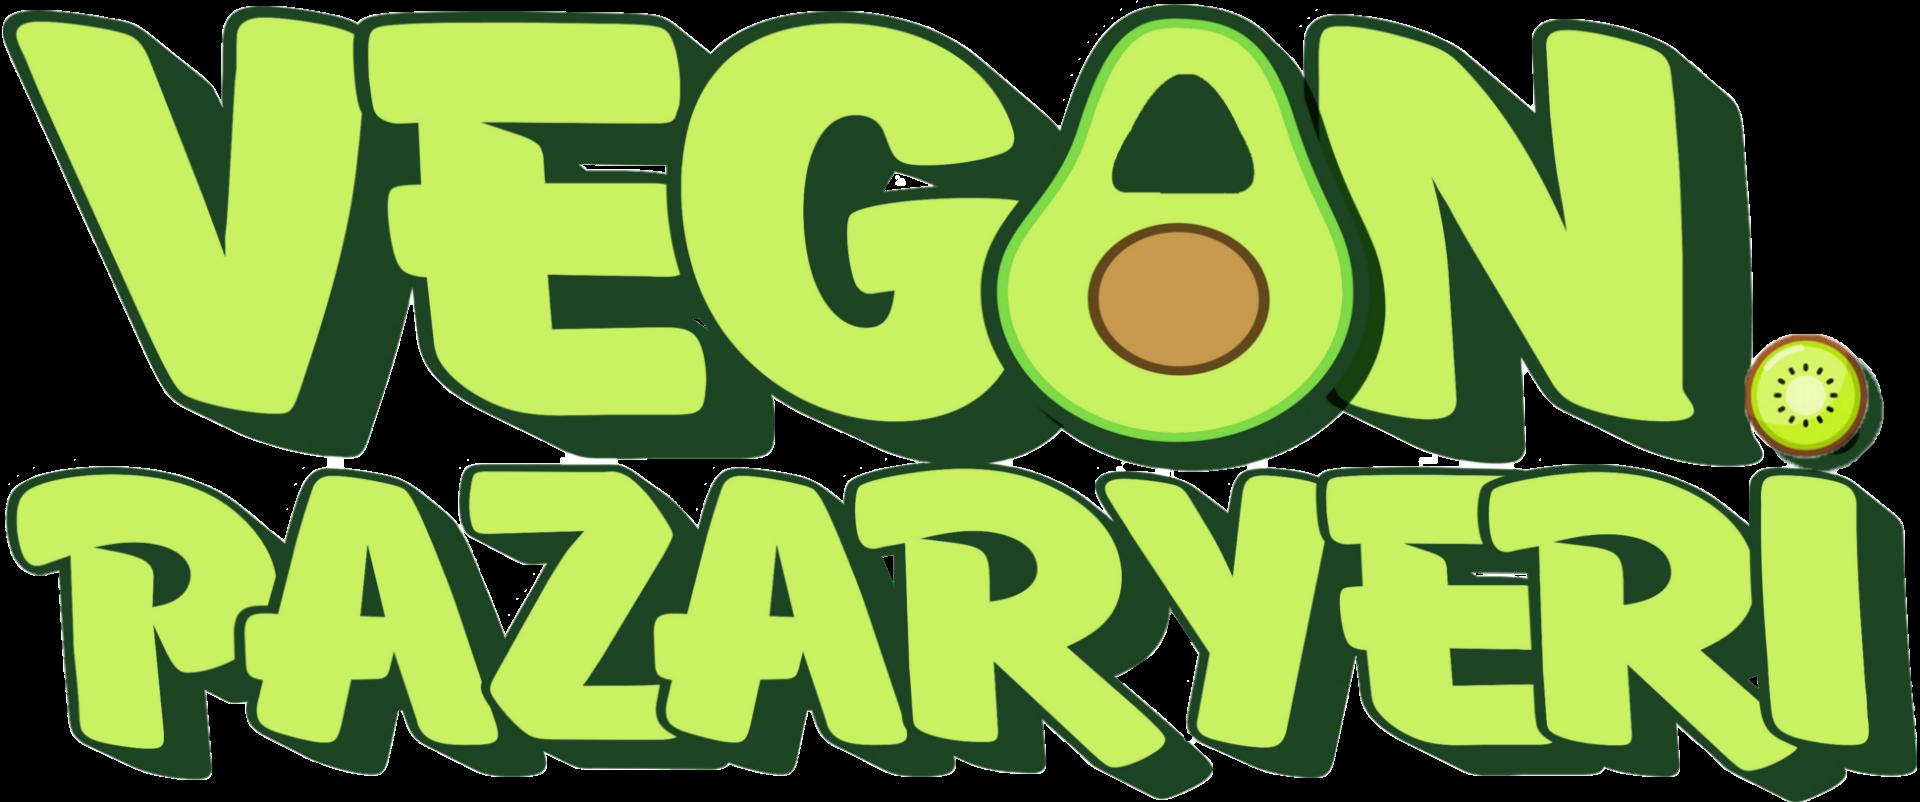 Vegan Pazaryeri